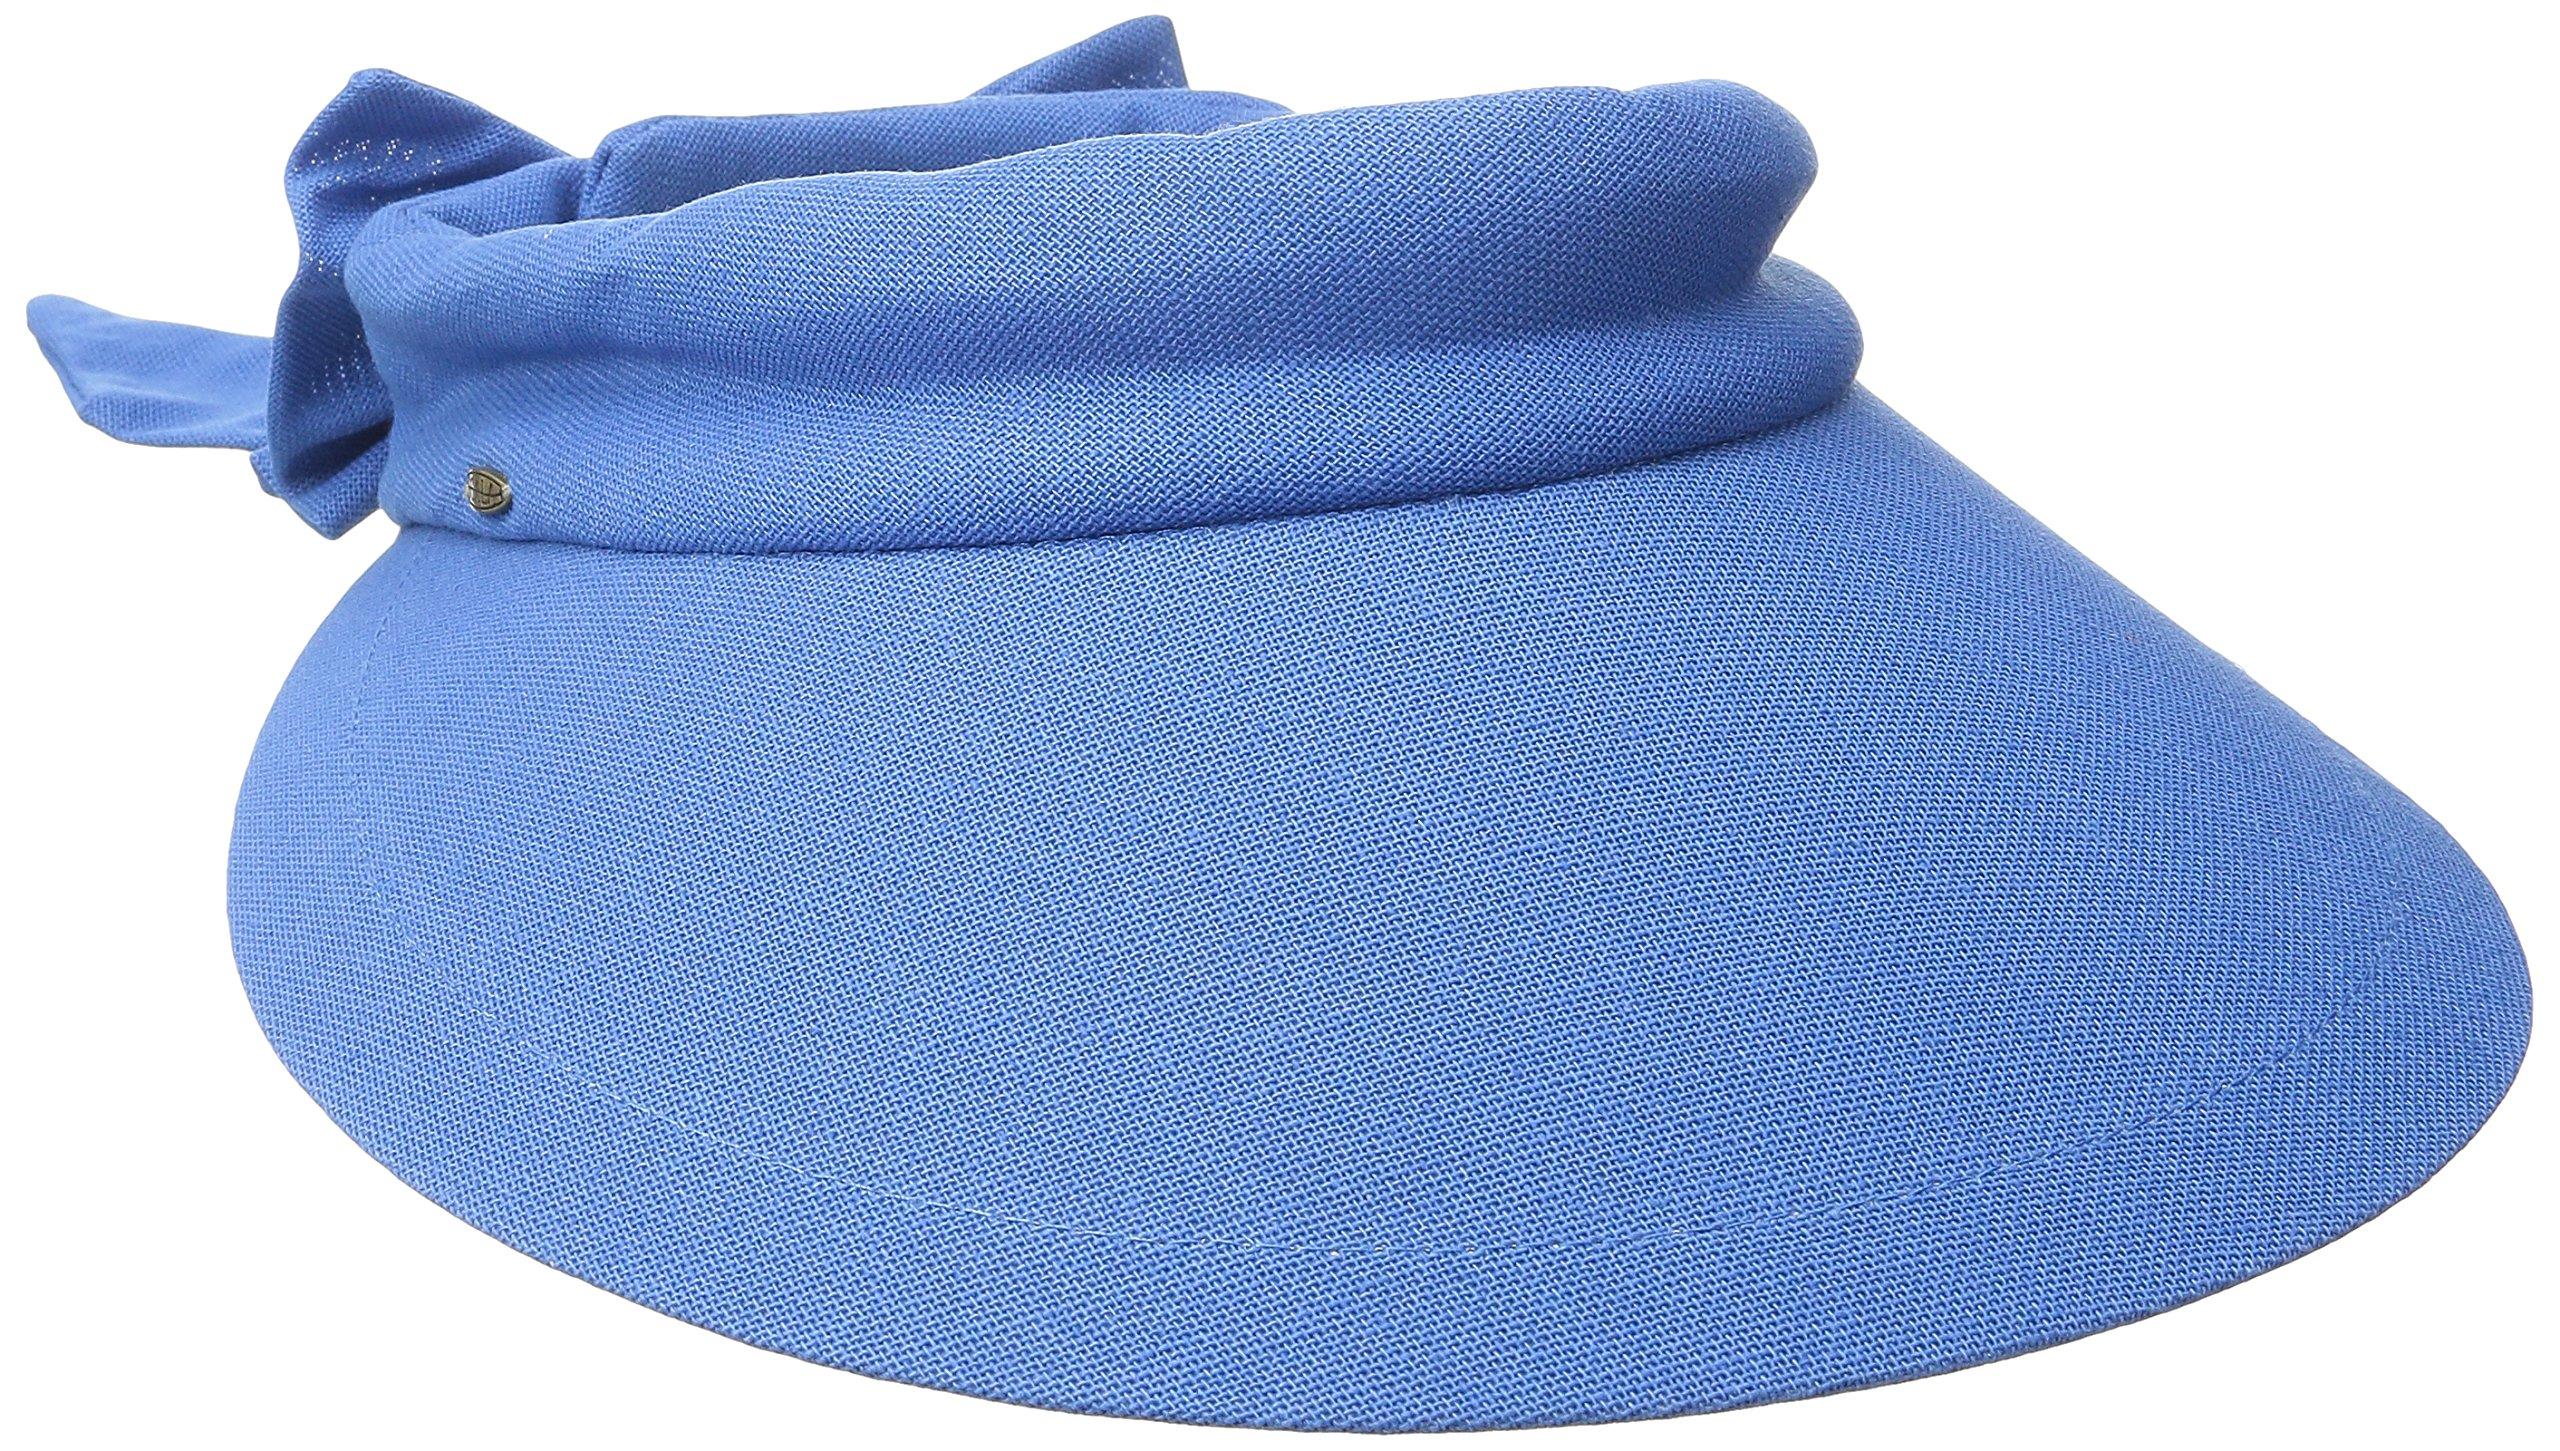 2c91e1fe352 SCALA Visor with Big Brim – Large Visor Hat – Big Brim Sun Hats for Women